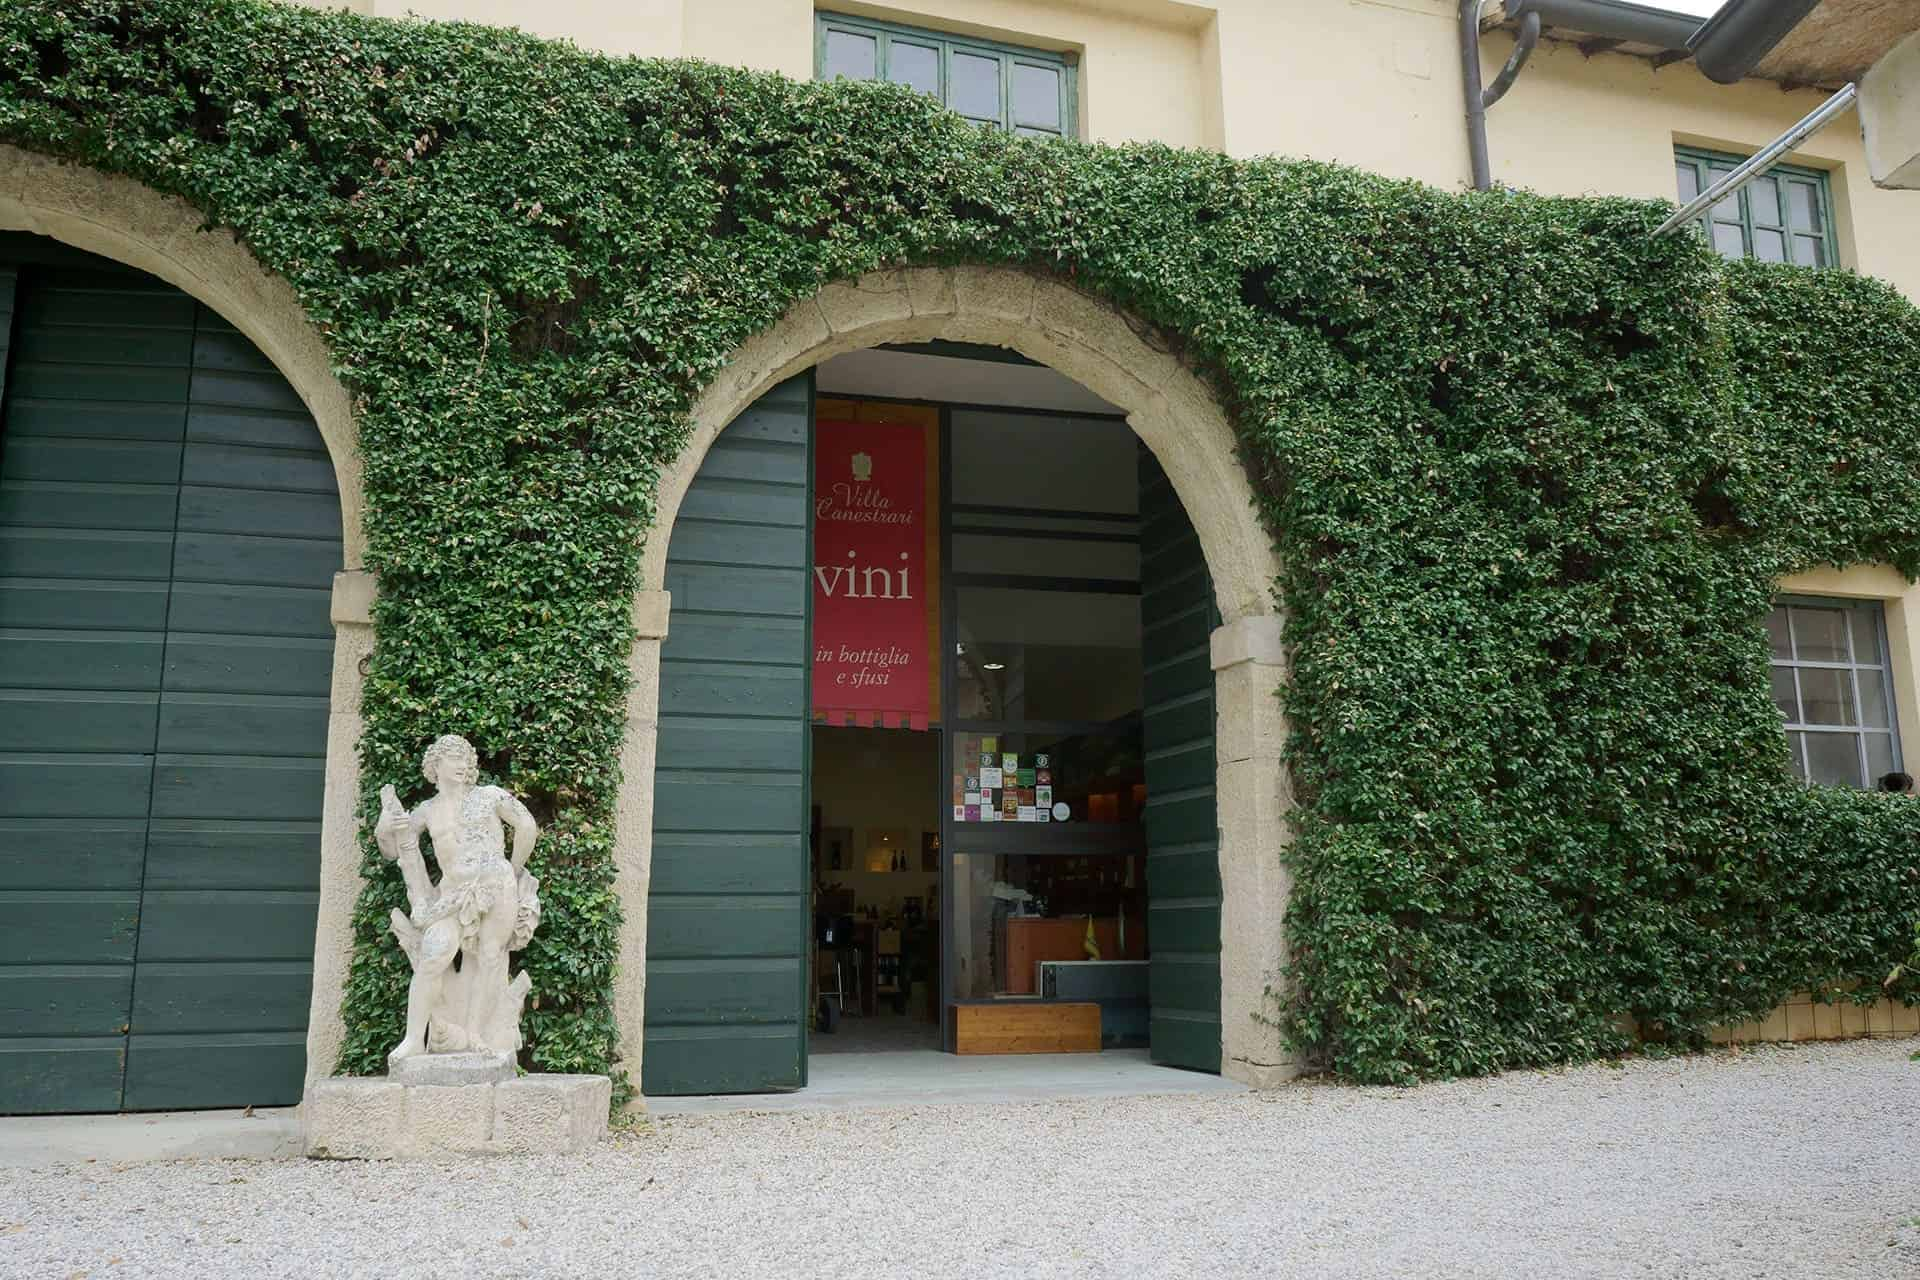 wine shop villa canestrari vendita vino